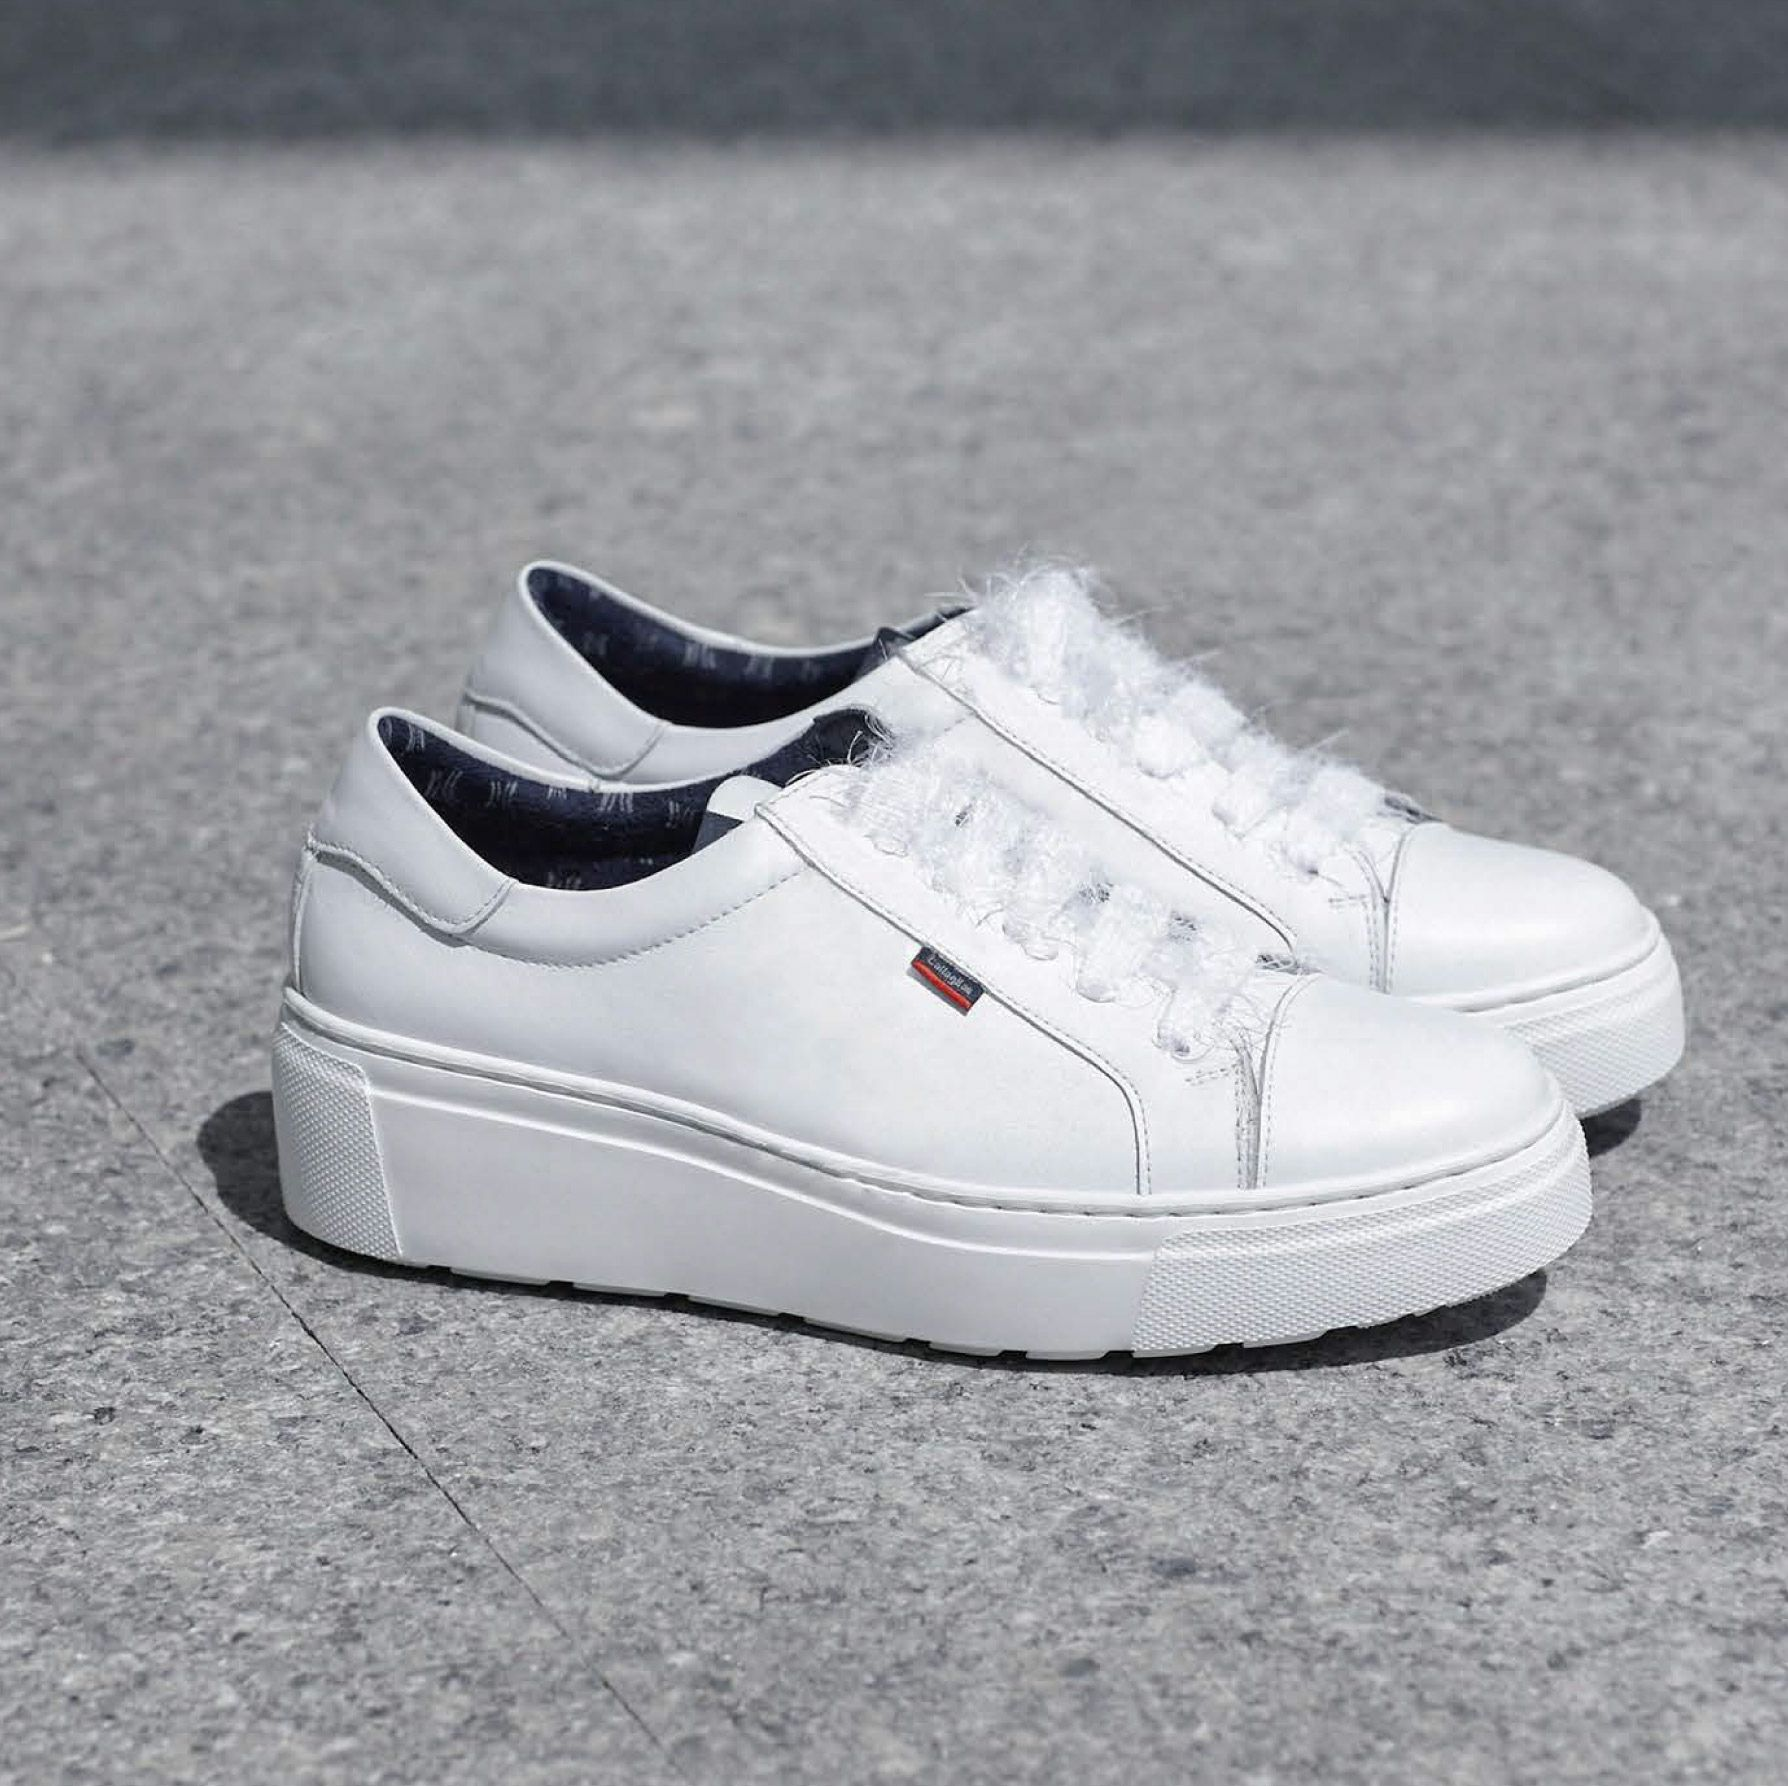 Calais | All white sneakers, Flatform sneakers, White sneaker